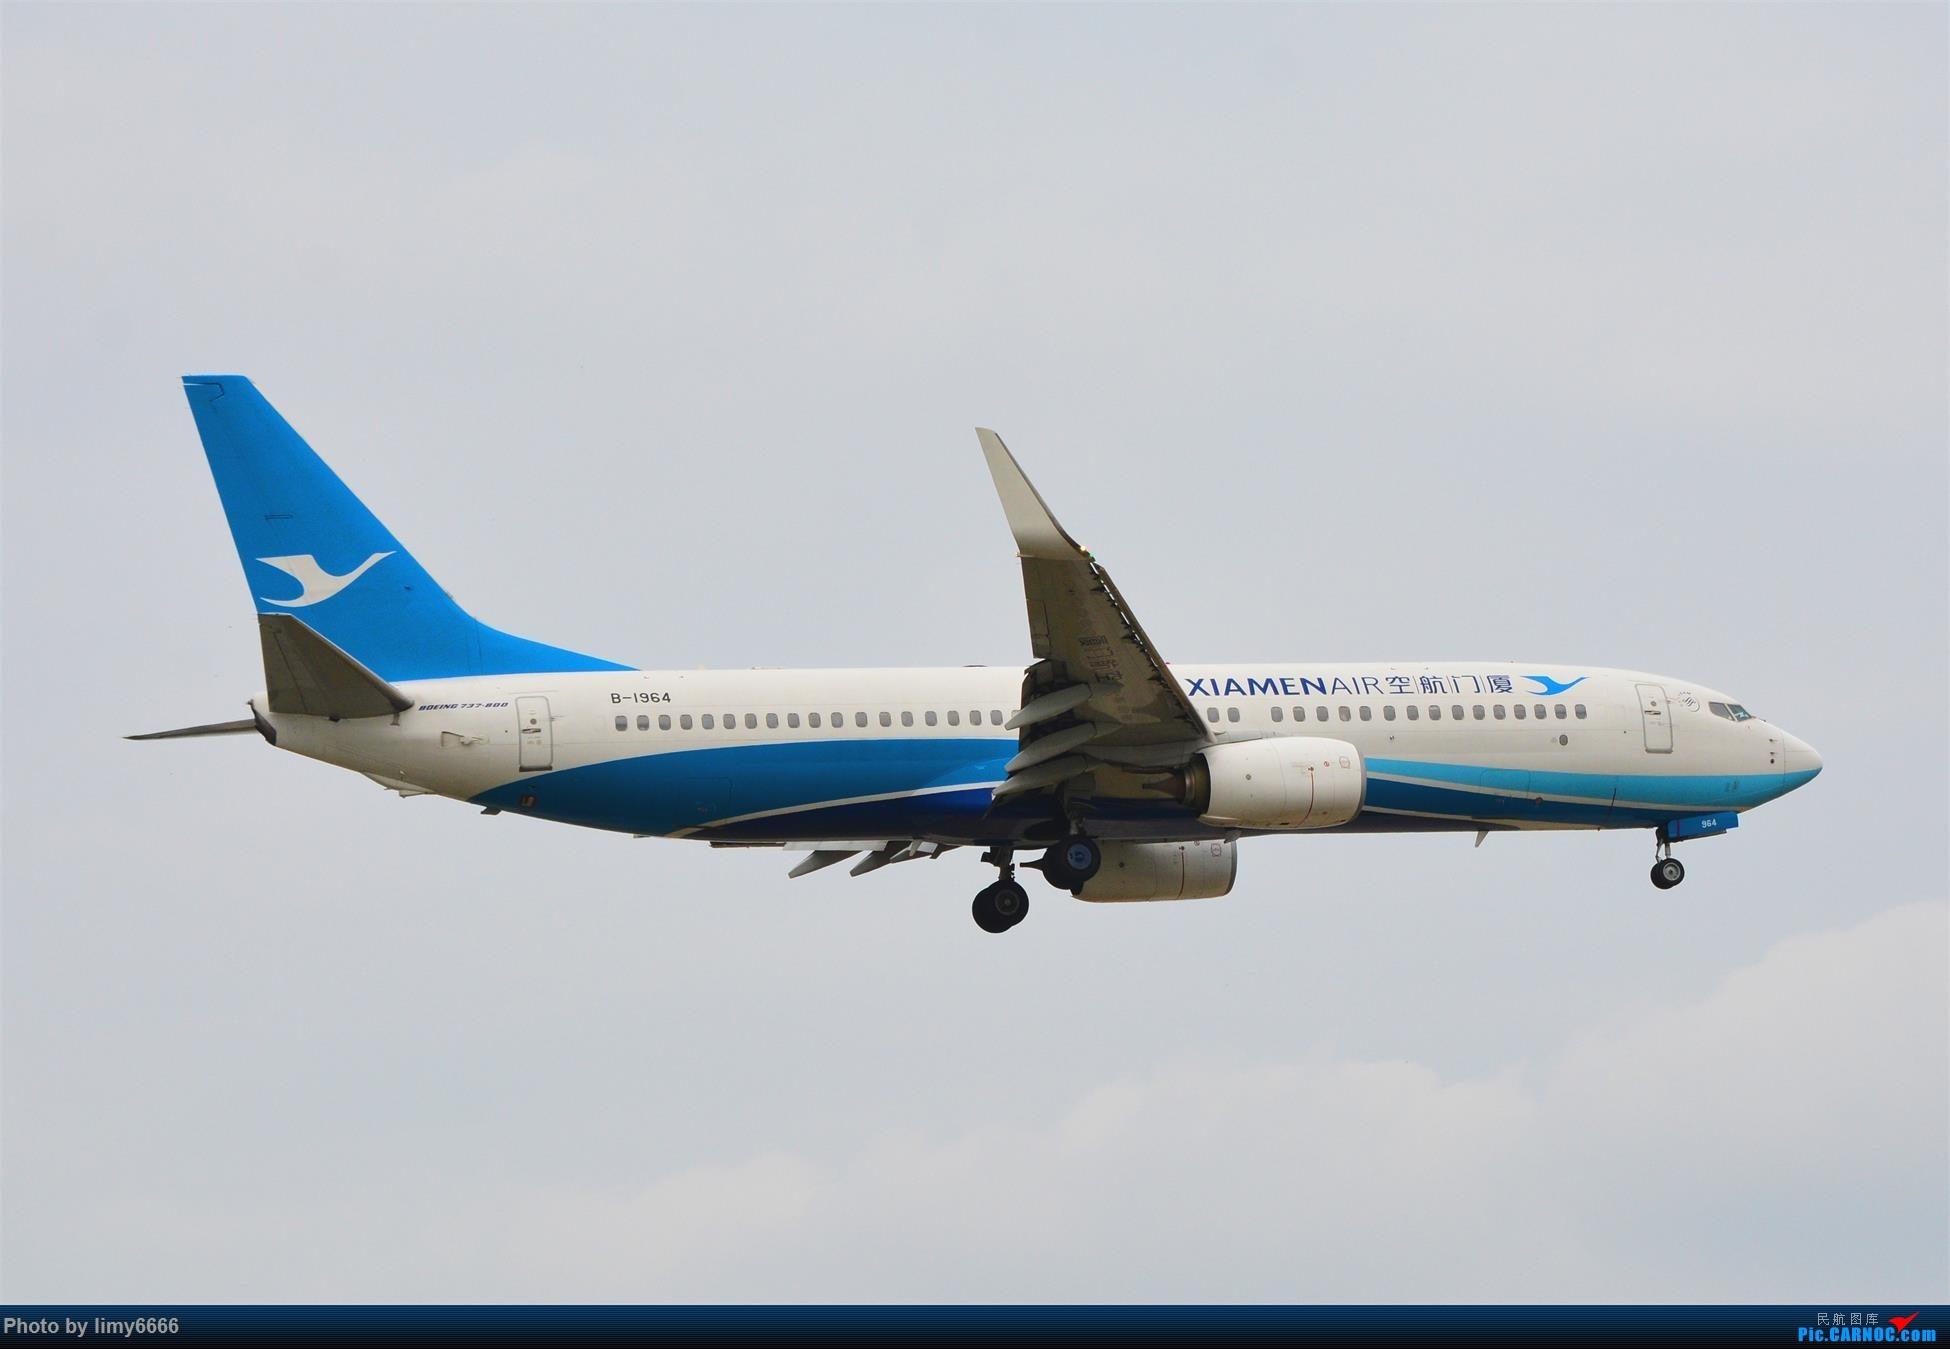 Re:[原创]上海虹桥机场拍机(在贵阳很少见或看不见的) BOEING 737-800 B-1964 中国上海虹桥国际机场